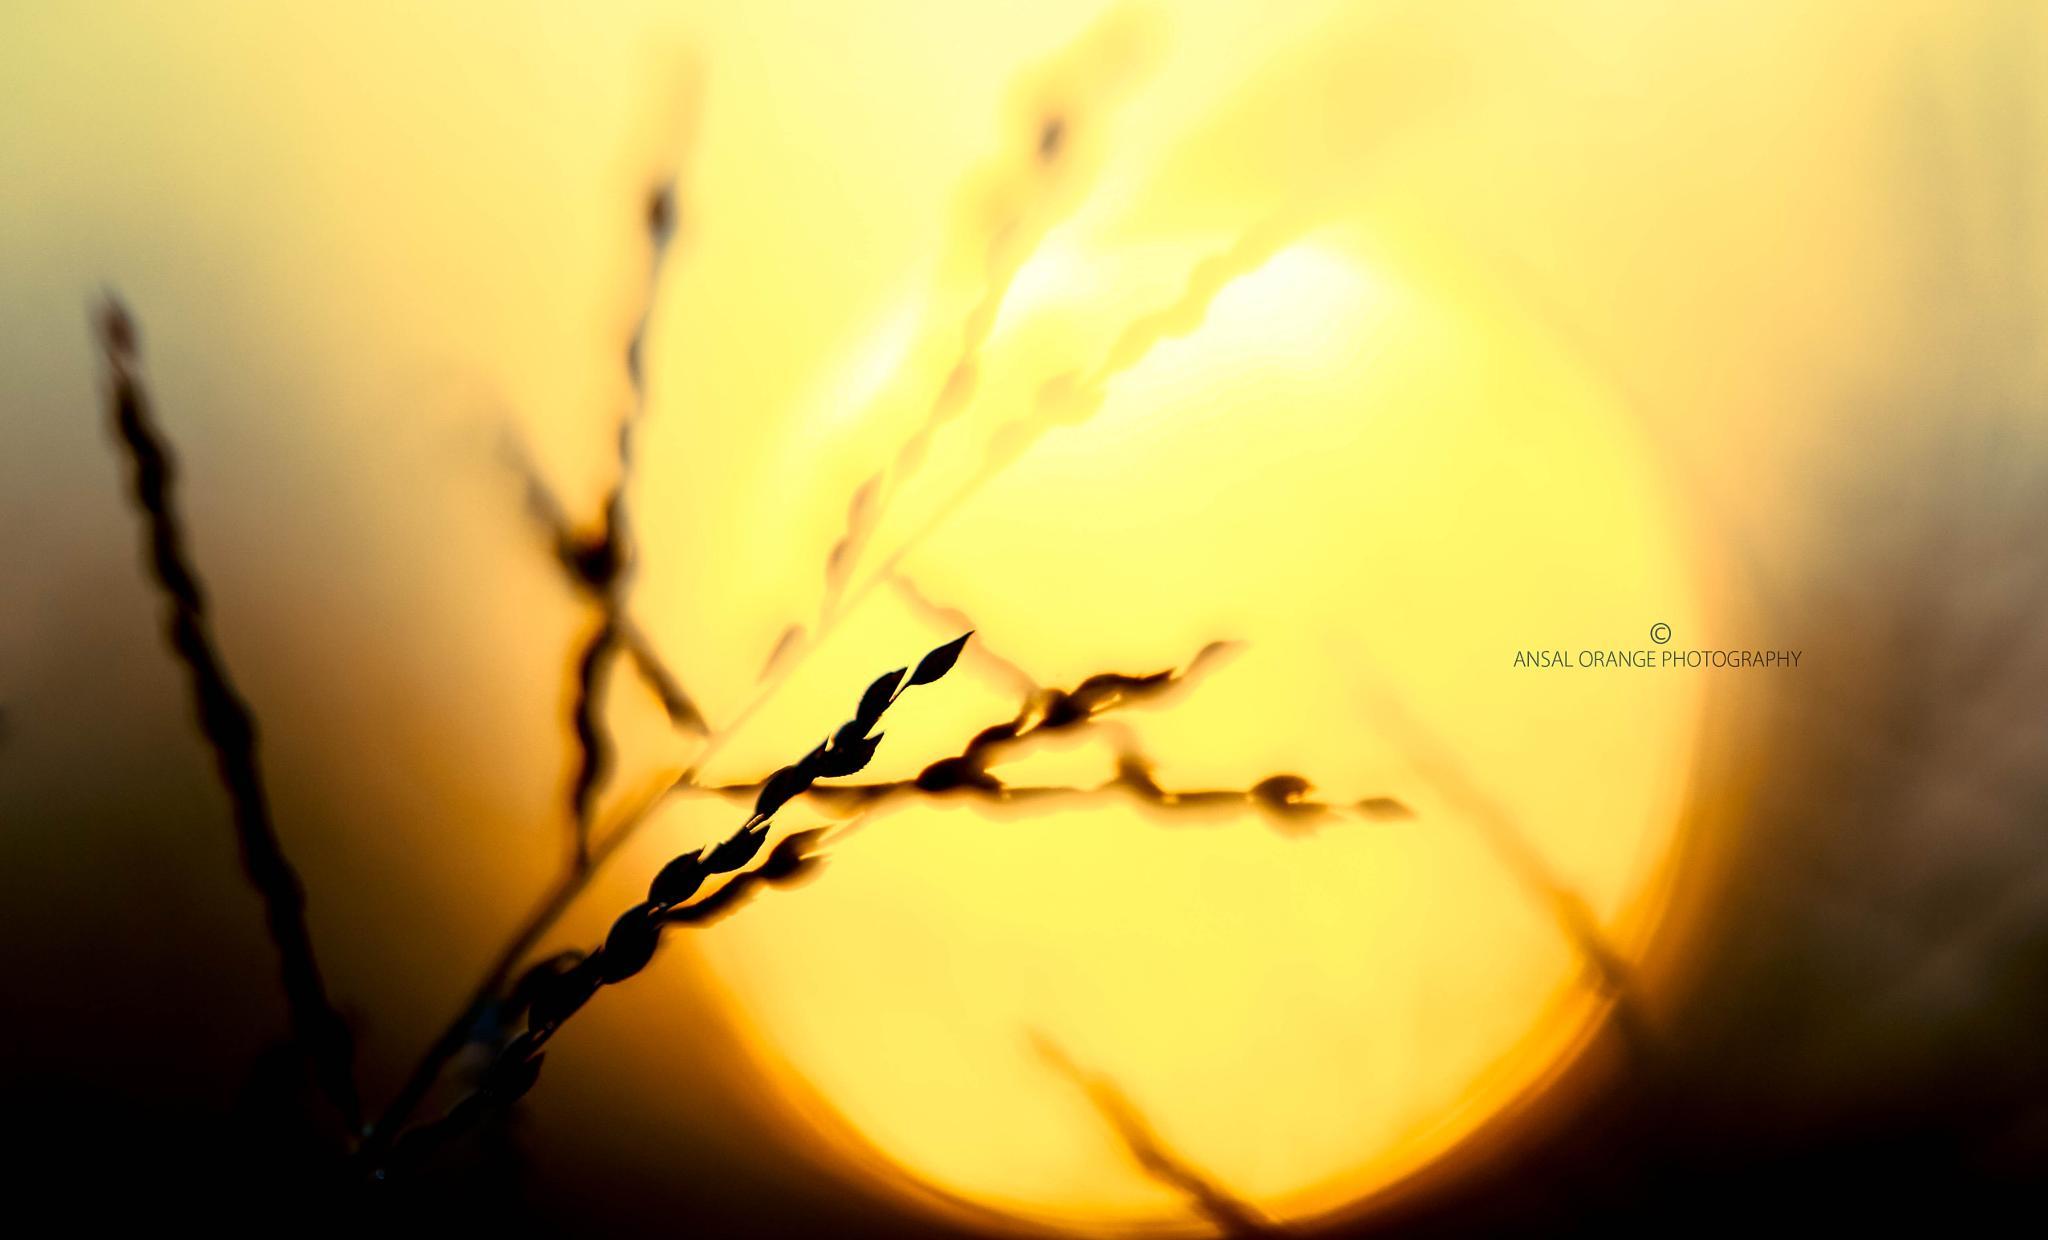 Sun Rise by Ansal Orange